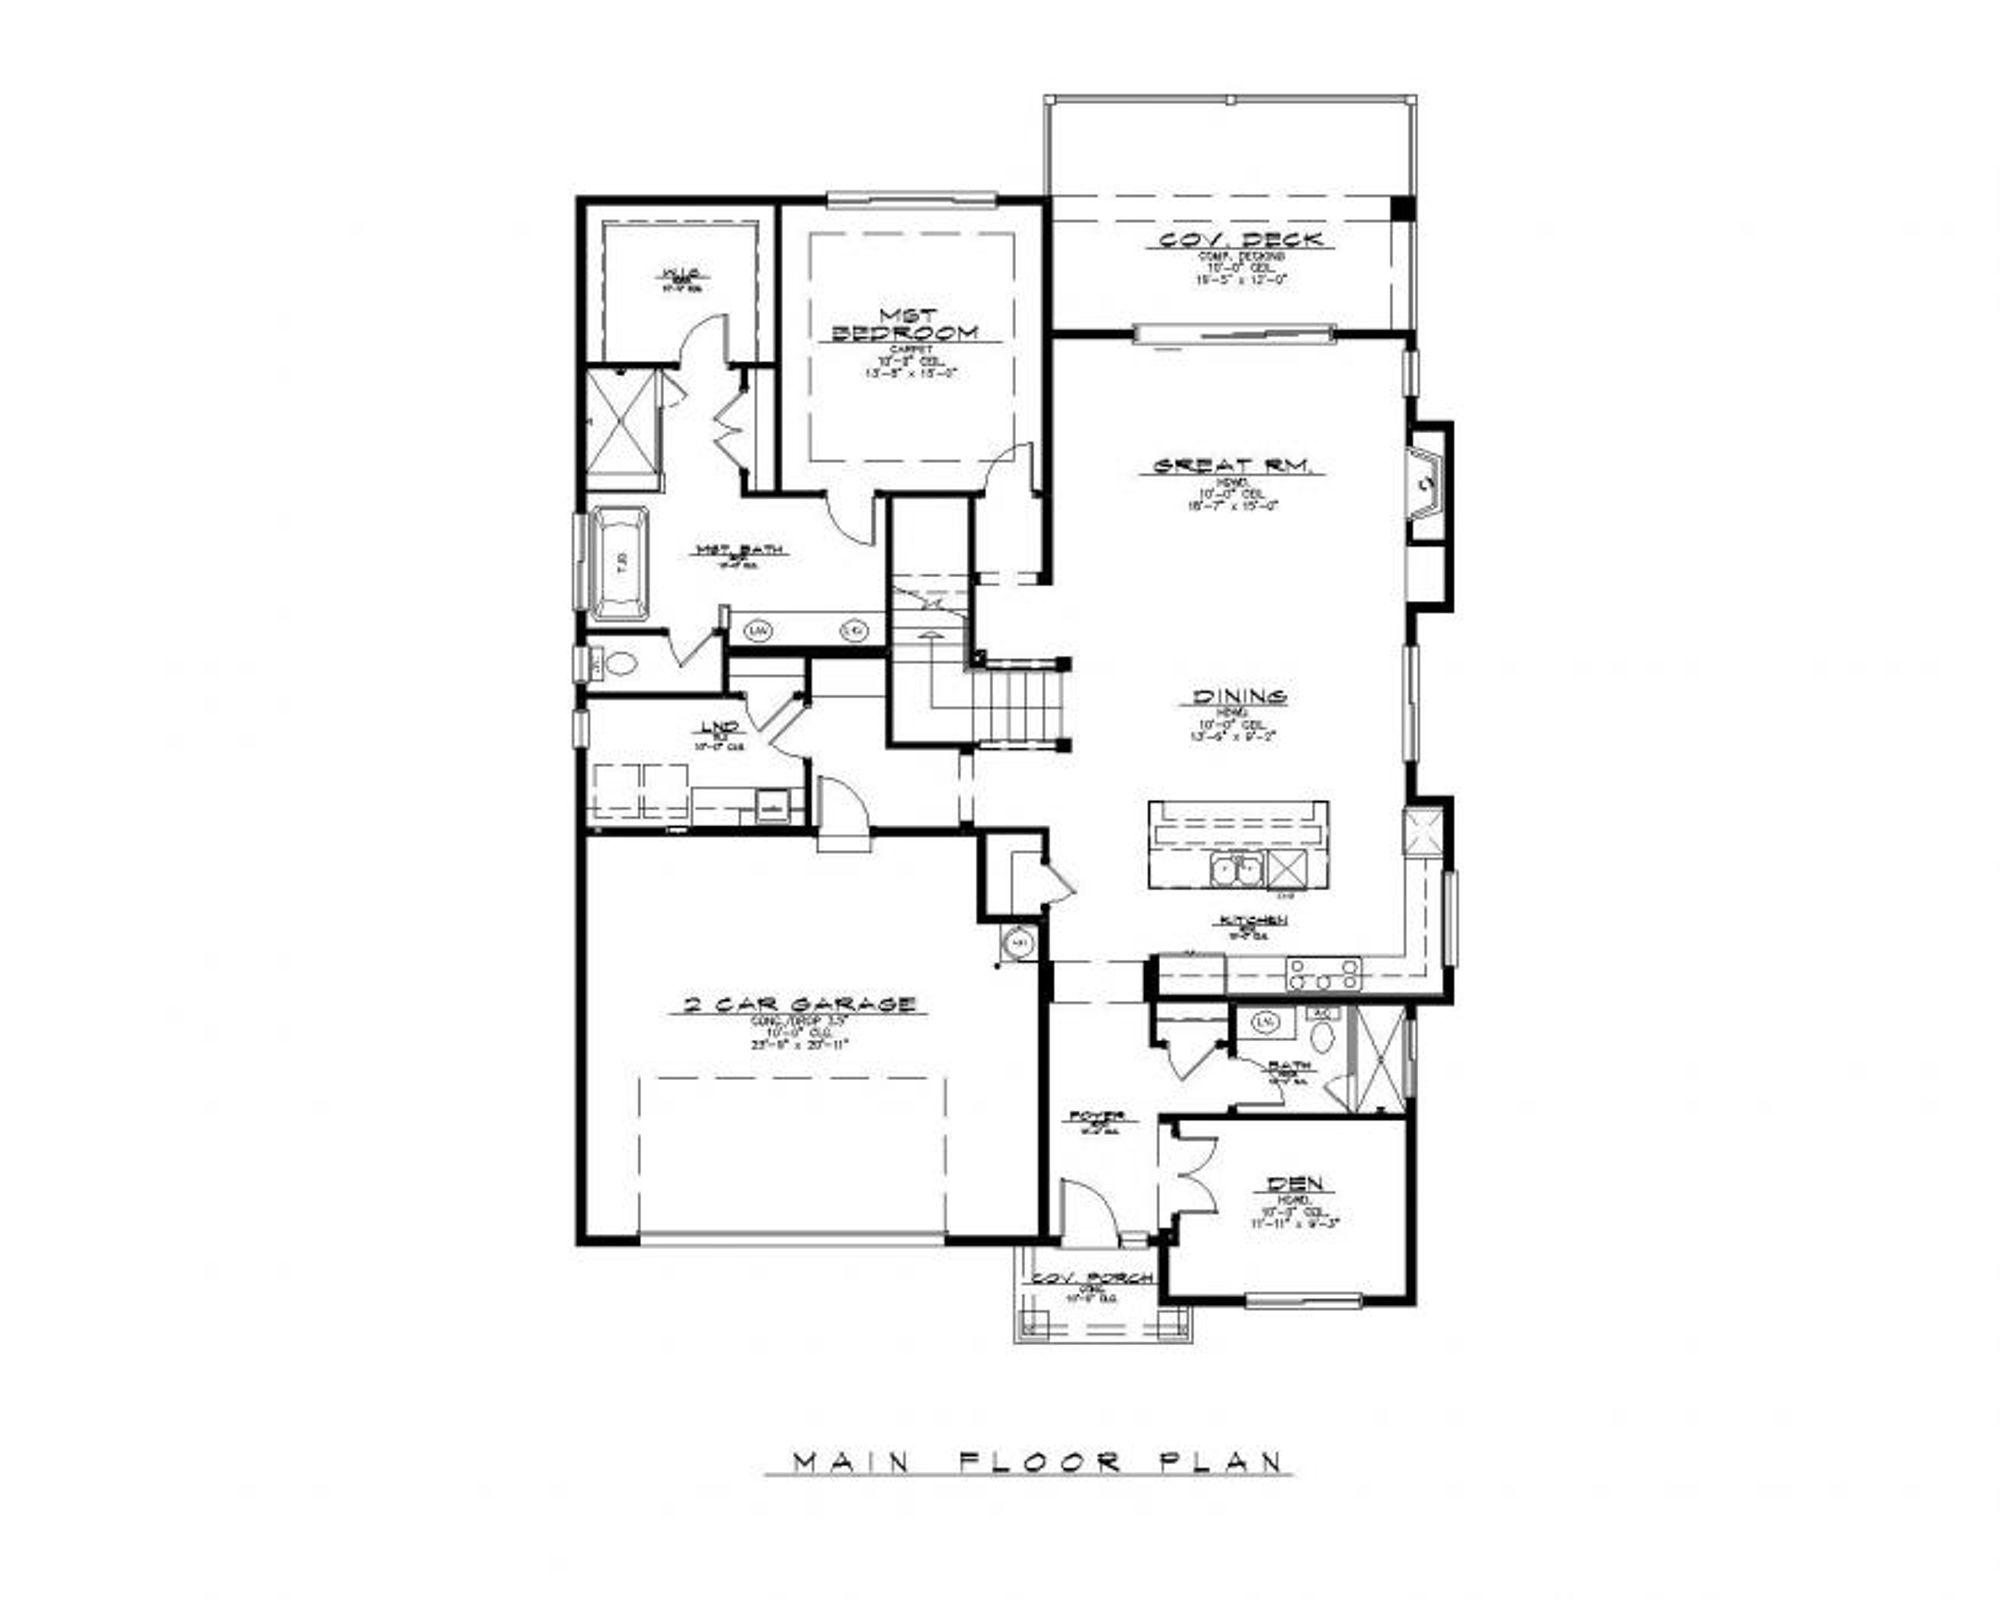 Santa Barbara Main Floor Plan